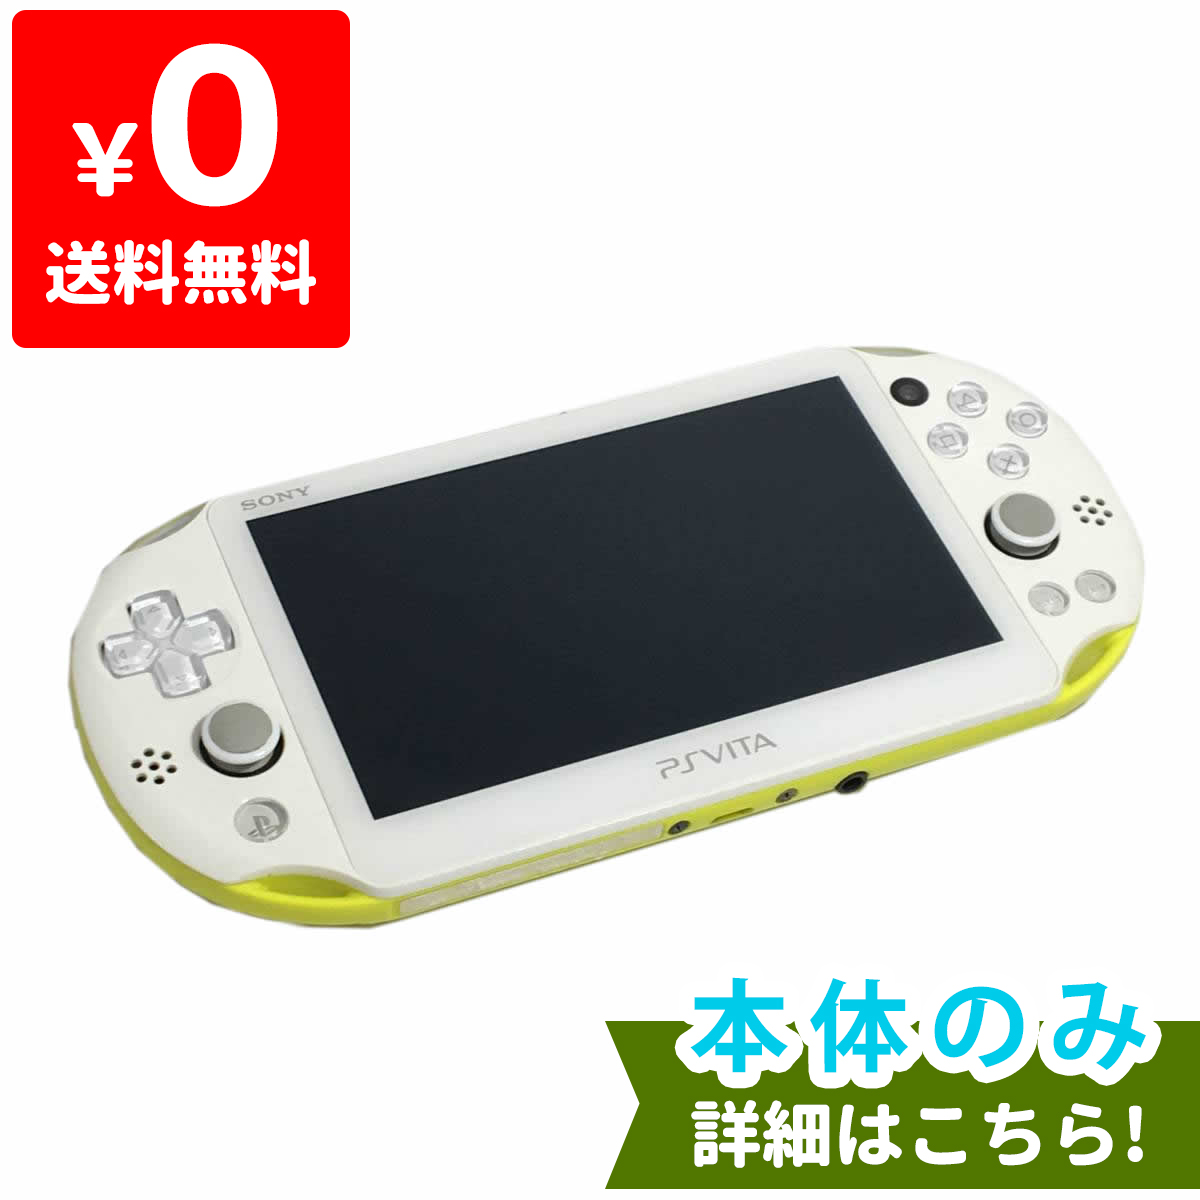 PSVita 2000 PlayStation Vita Wi-Fiモデル ライムグリーン/ホワイト (PCH-2000ZA13) 本体のみ PlayStationVita SONY ソニー 中古 4948872413671 送料無料 【中古】